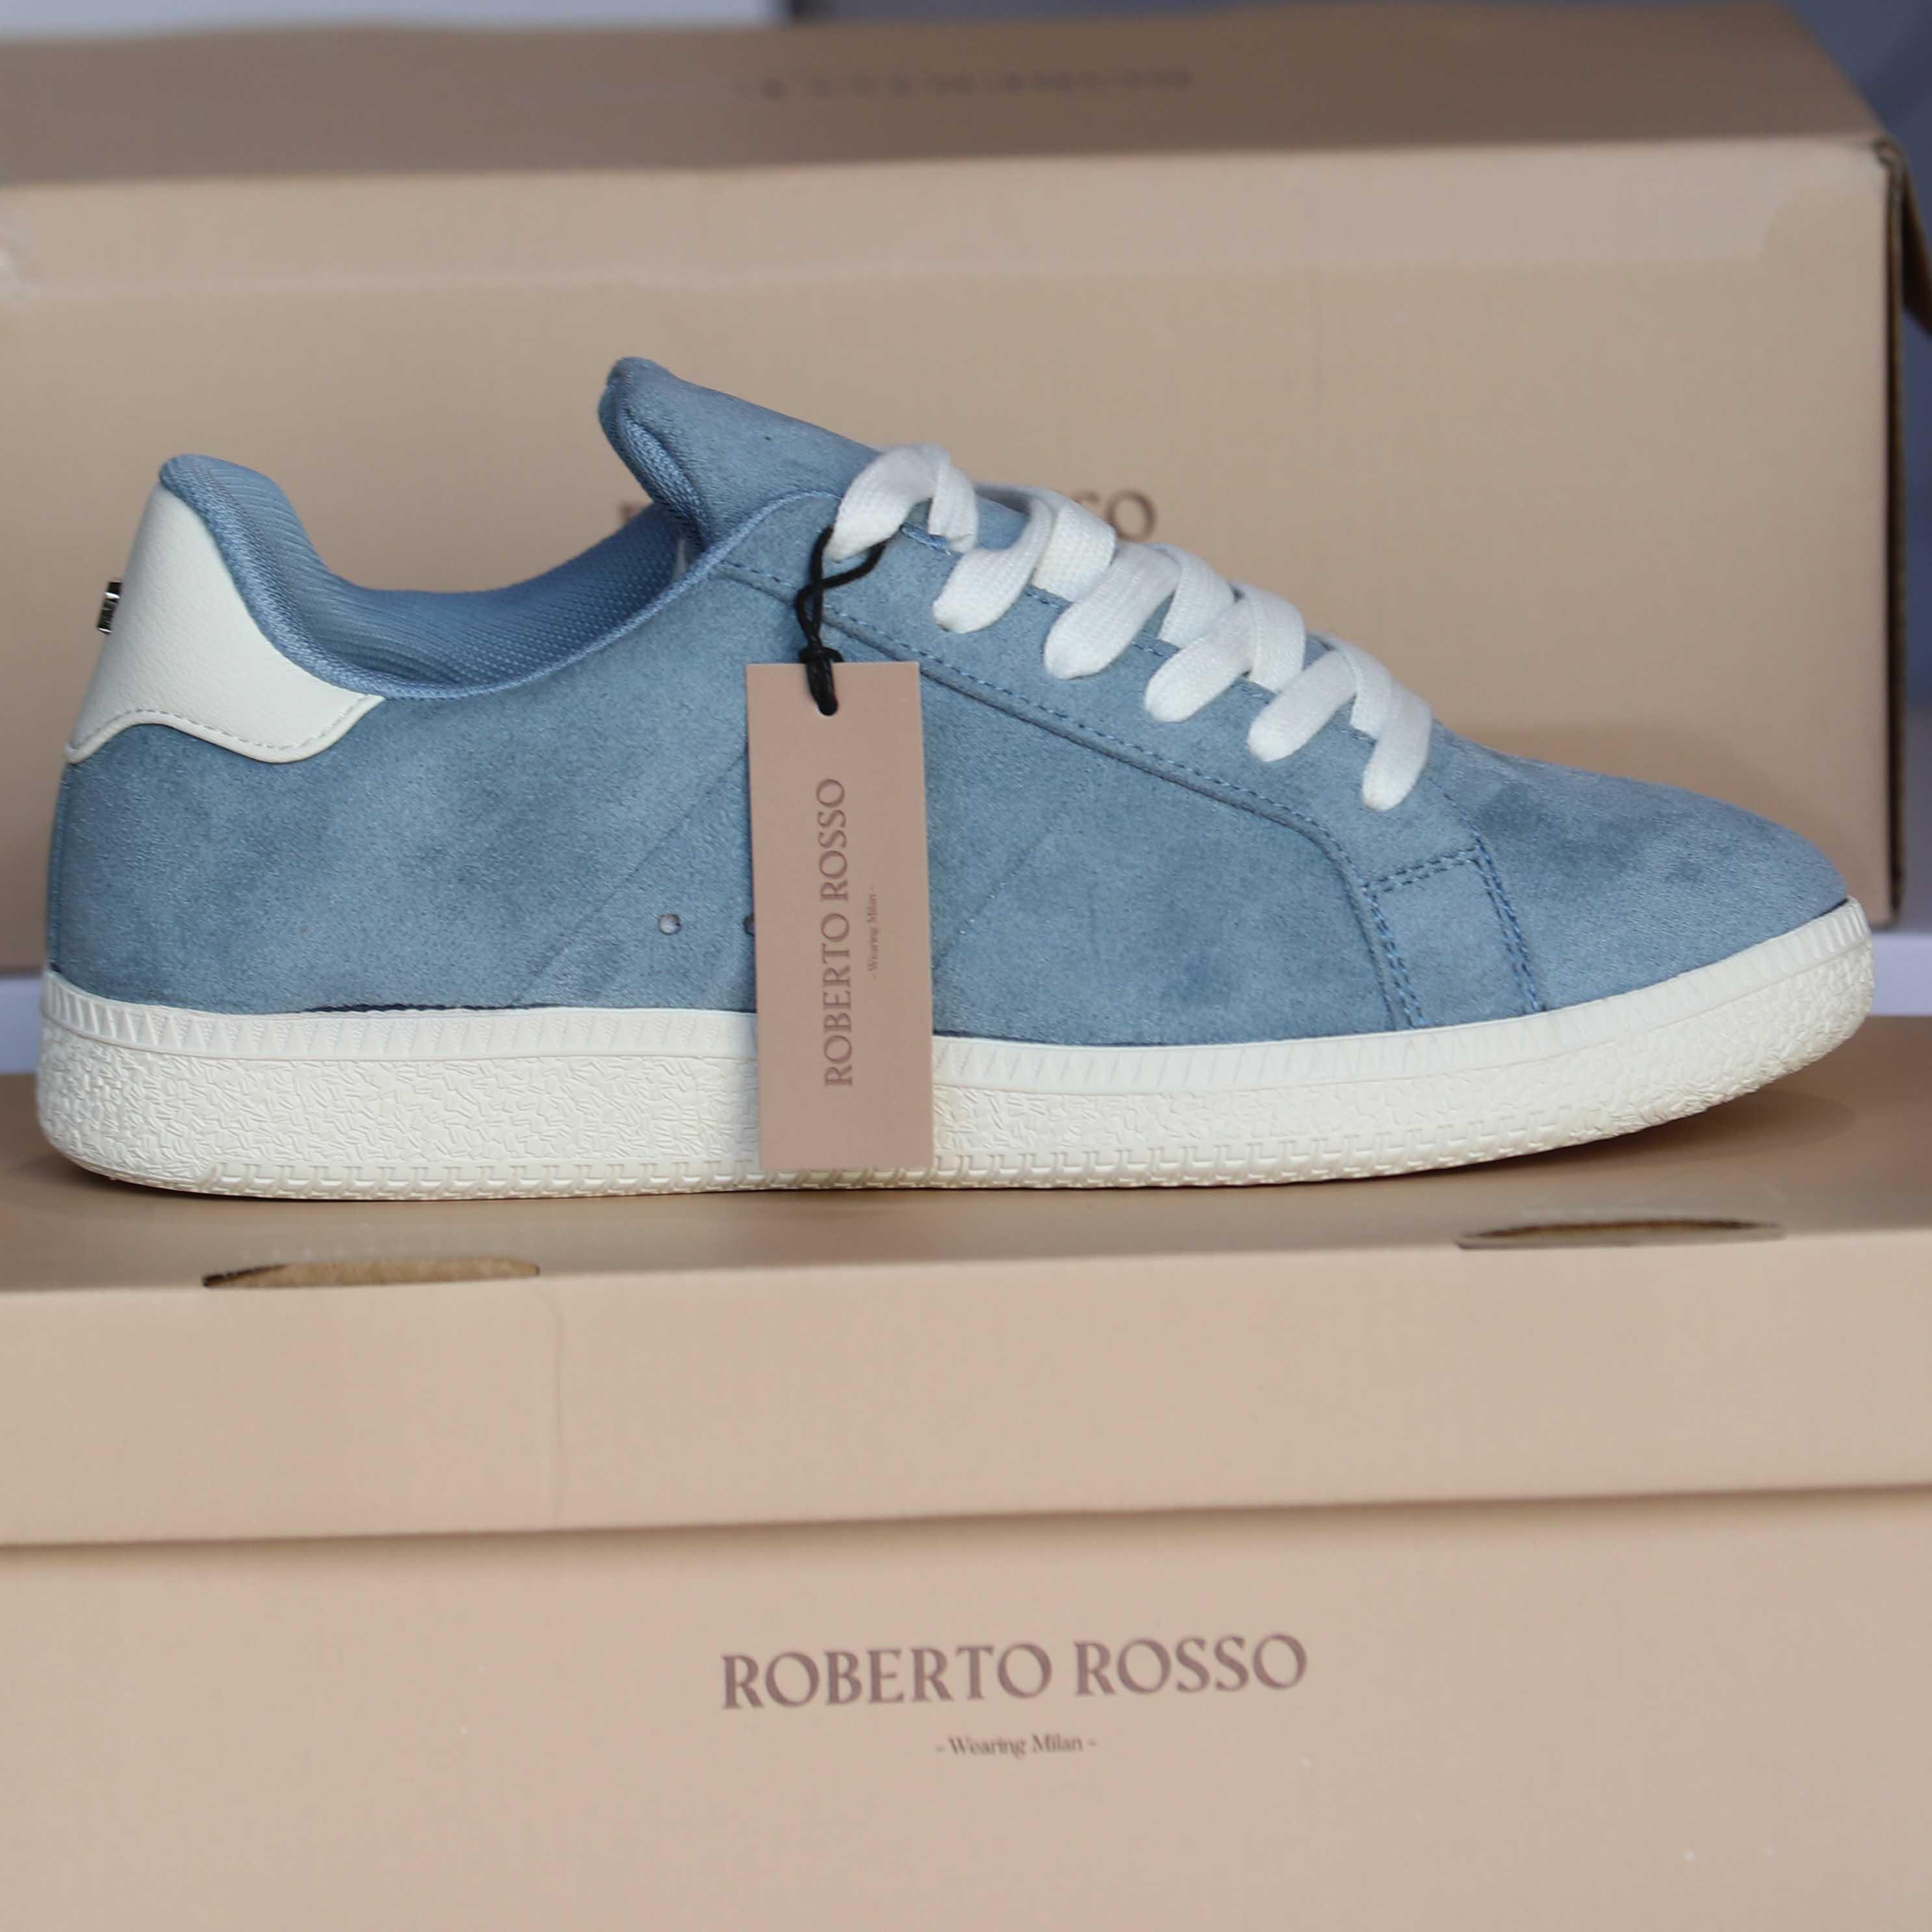 roberto rosso portiva blue sko sommer 3